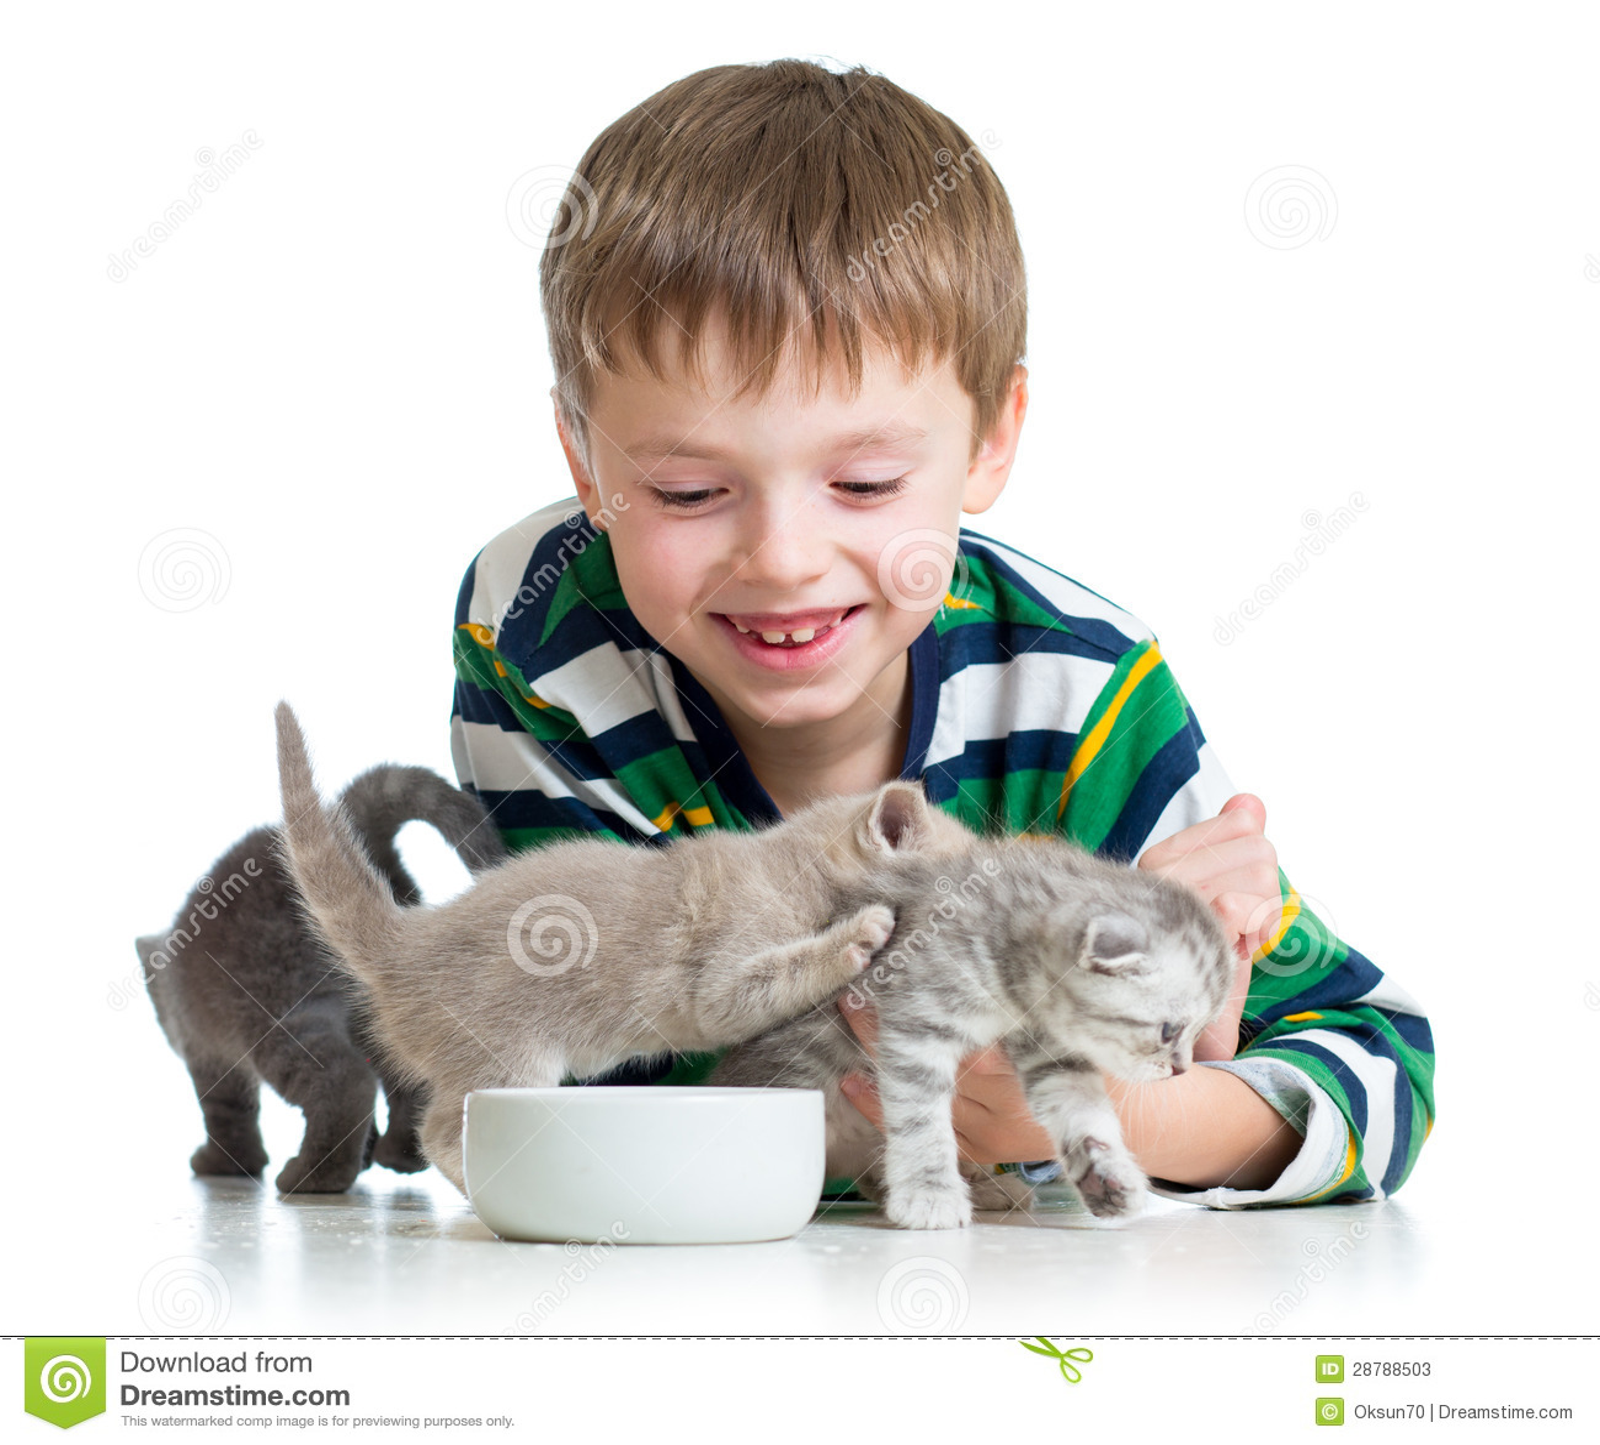 funny cute kittens videos